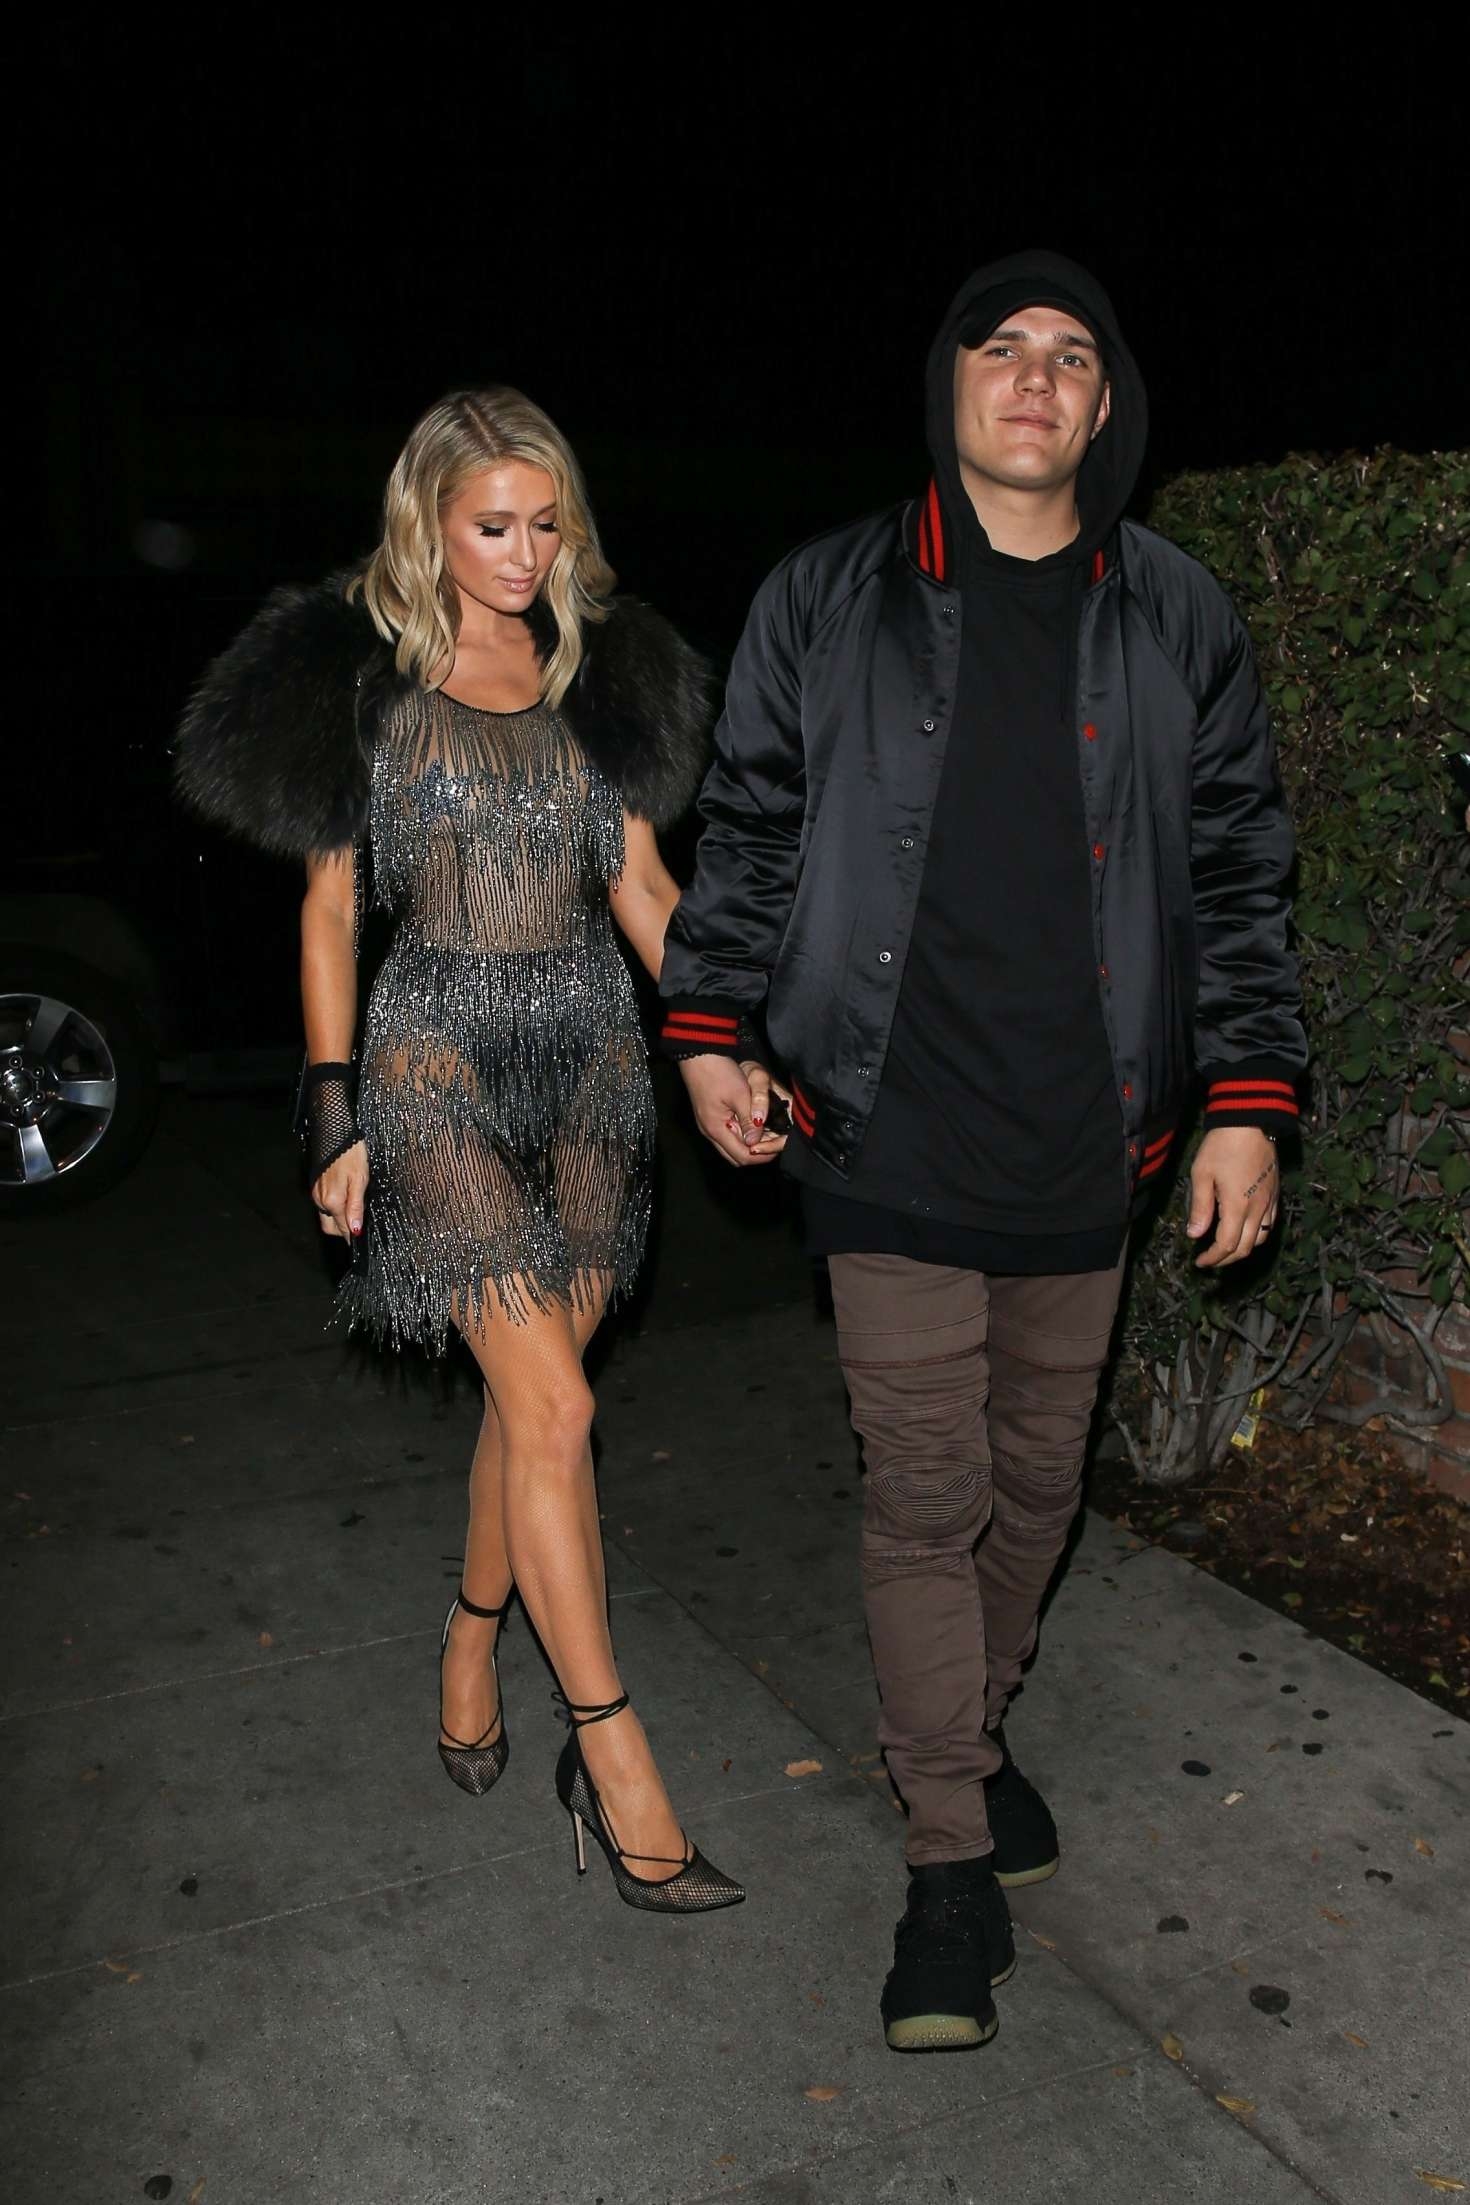 Paris Hilton - Seen at Delilah nightclub in West Hollywood